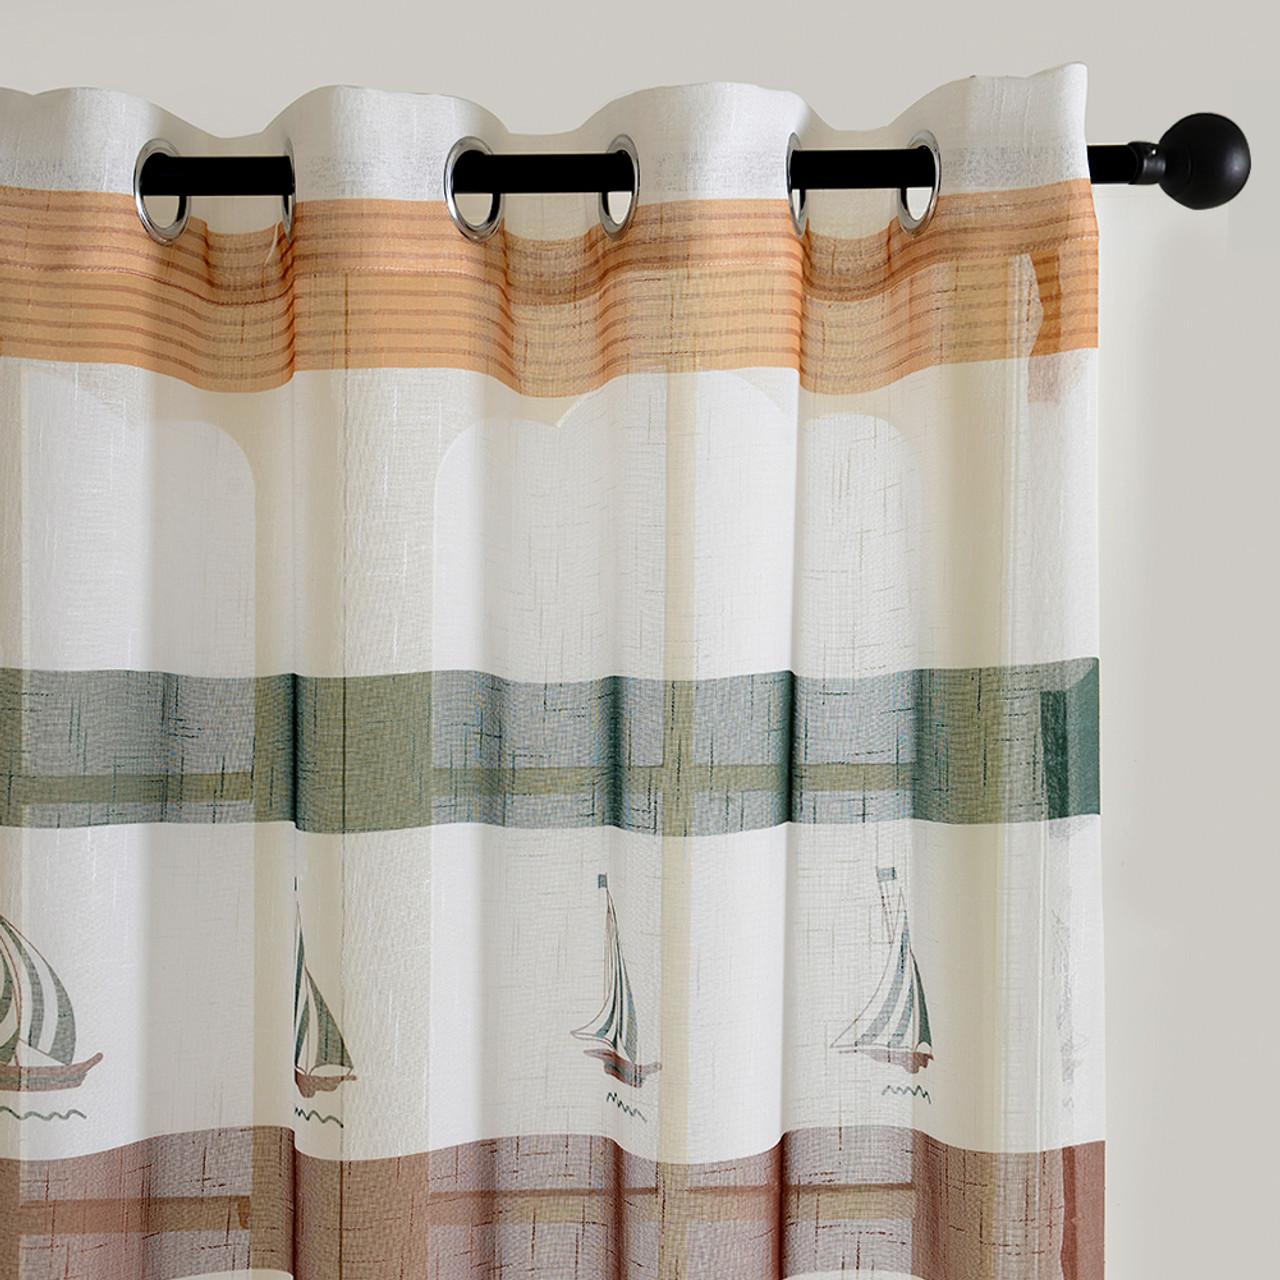 Bermuda - DMC486 - Dolce Mela Sheer Curtain Panels